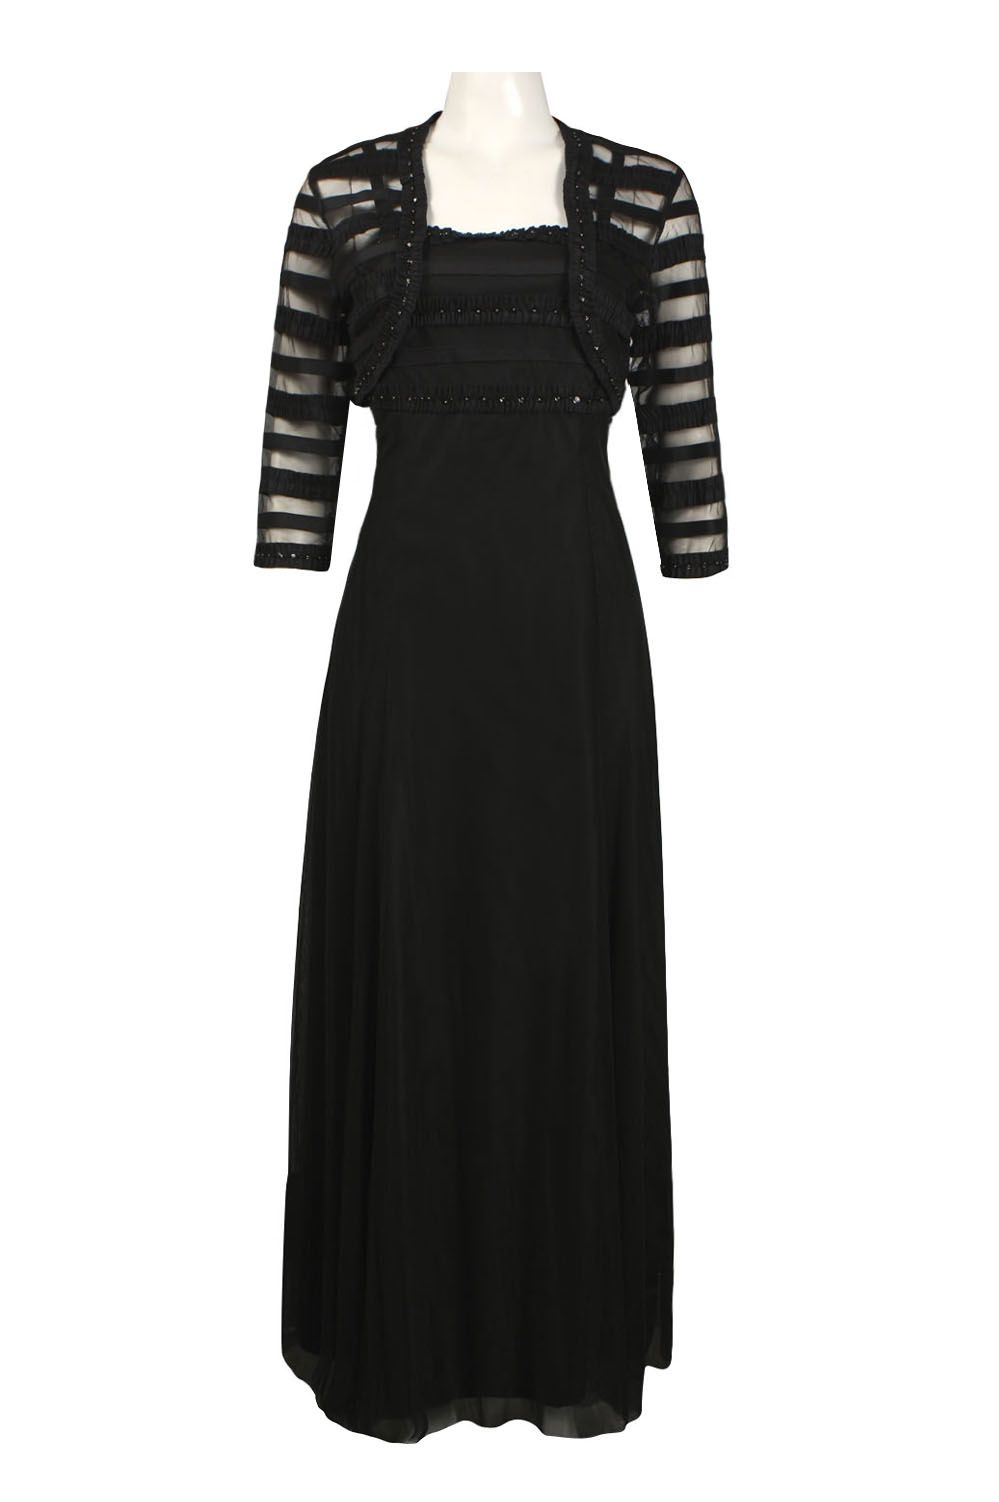 Km Collections Dresses . Karen Miller